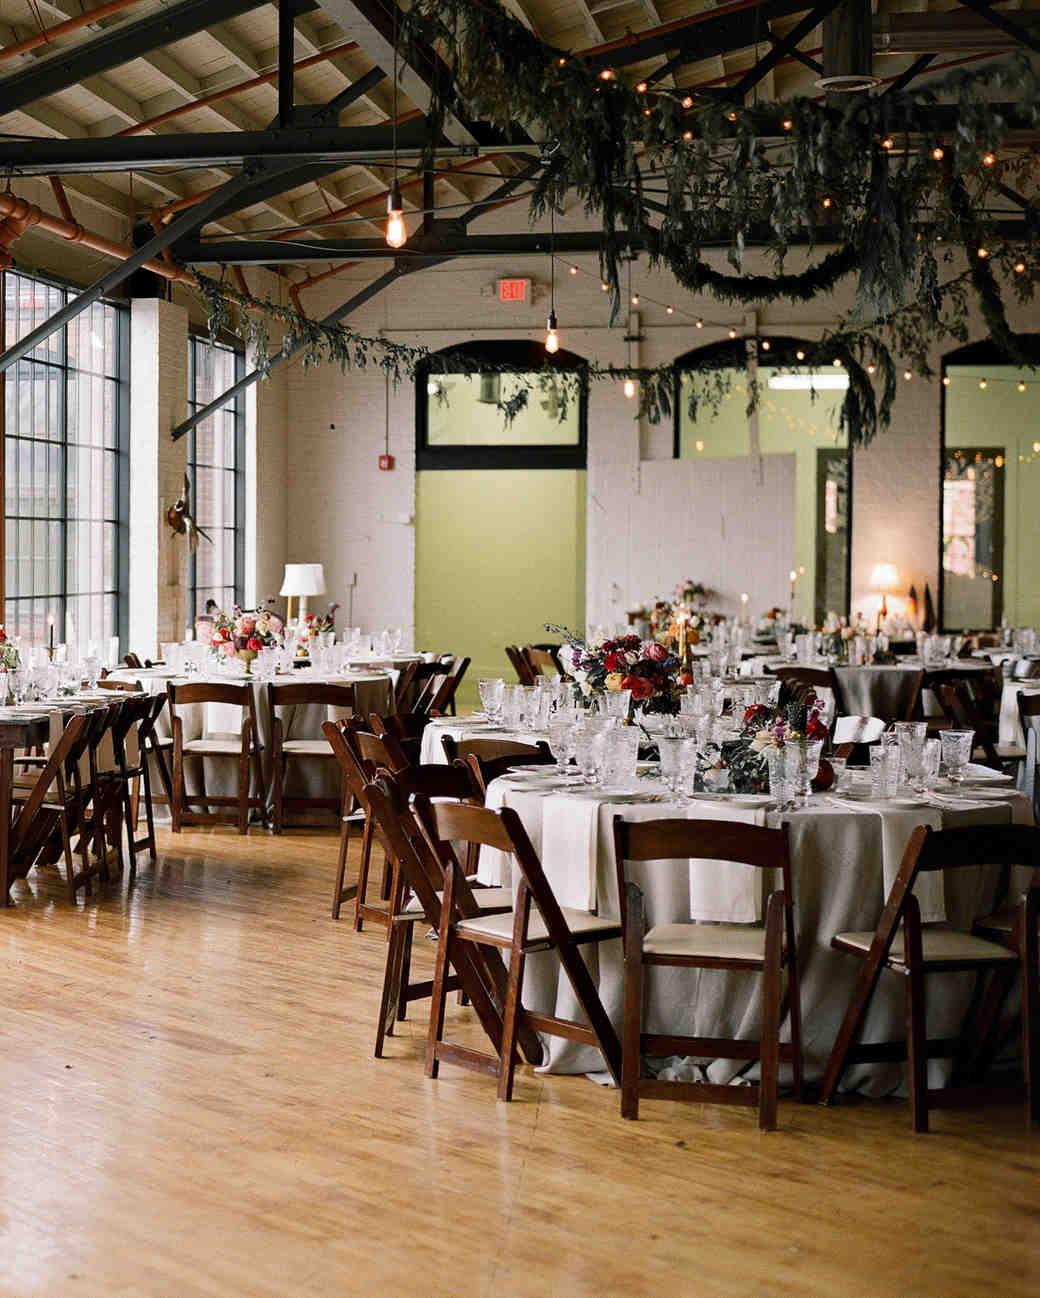 sidney-dane-wedding-reception-311-s112109-0815.jpg